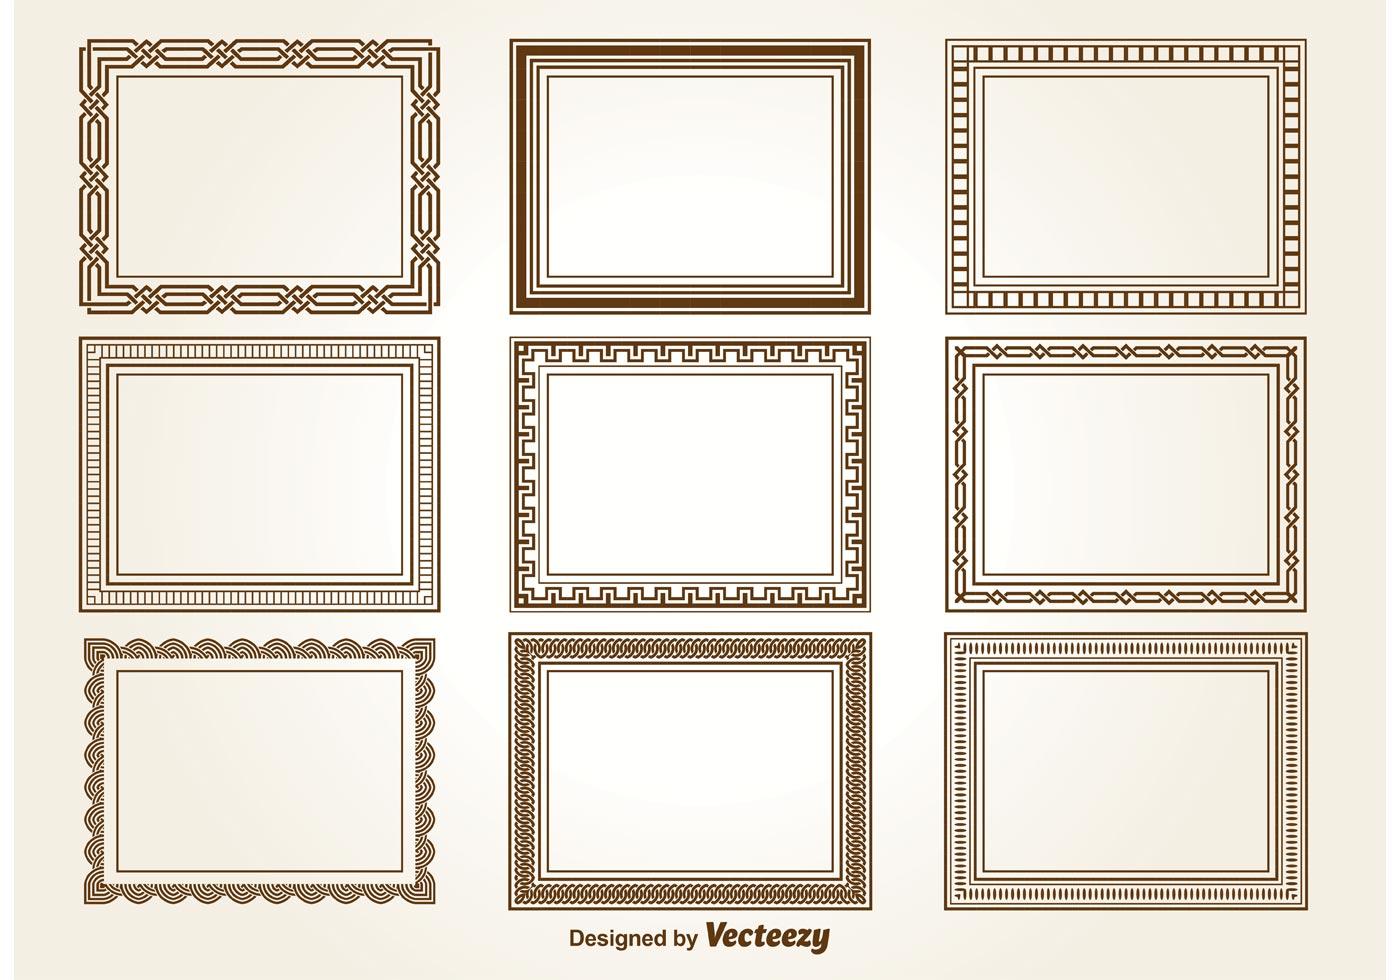 decorative square frames download free vector art stock graphics images. Black Bedroom Furniture Sets. Home Design Ideas